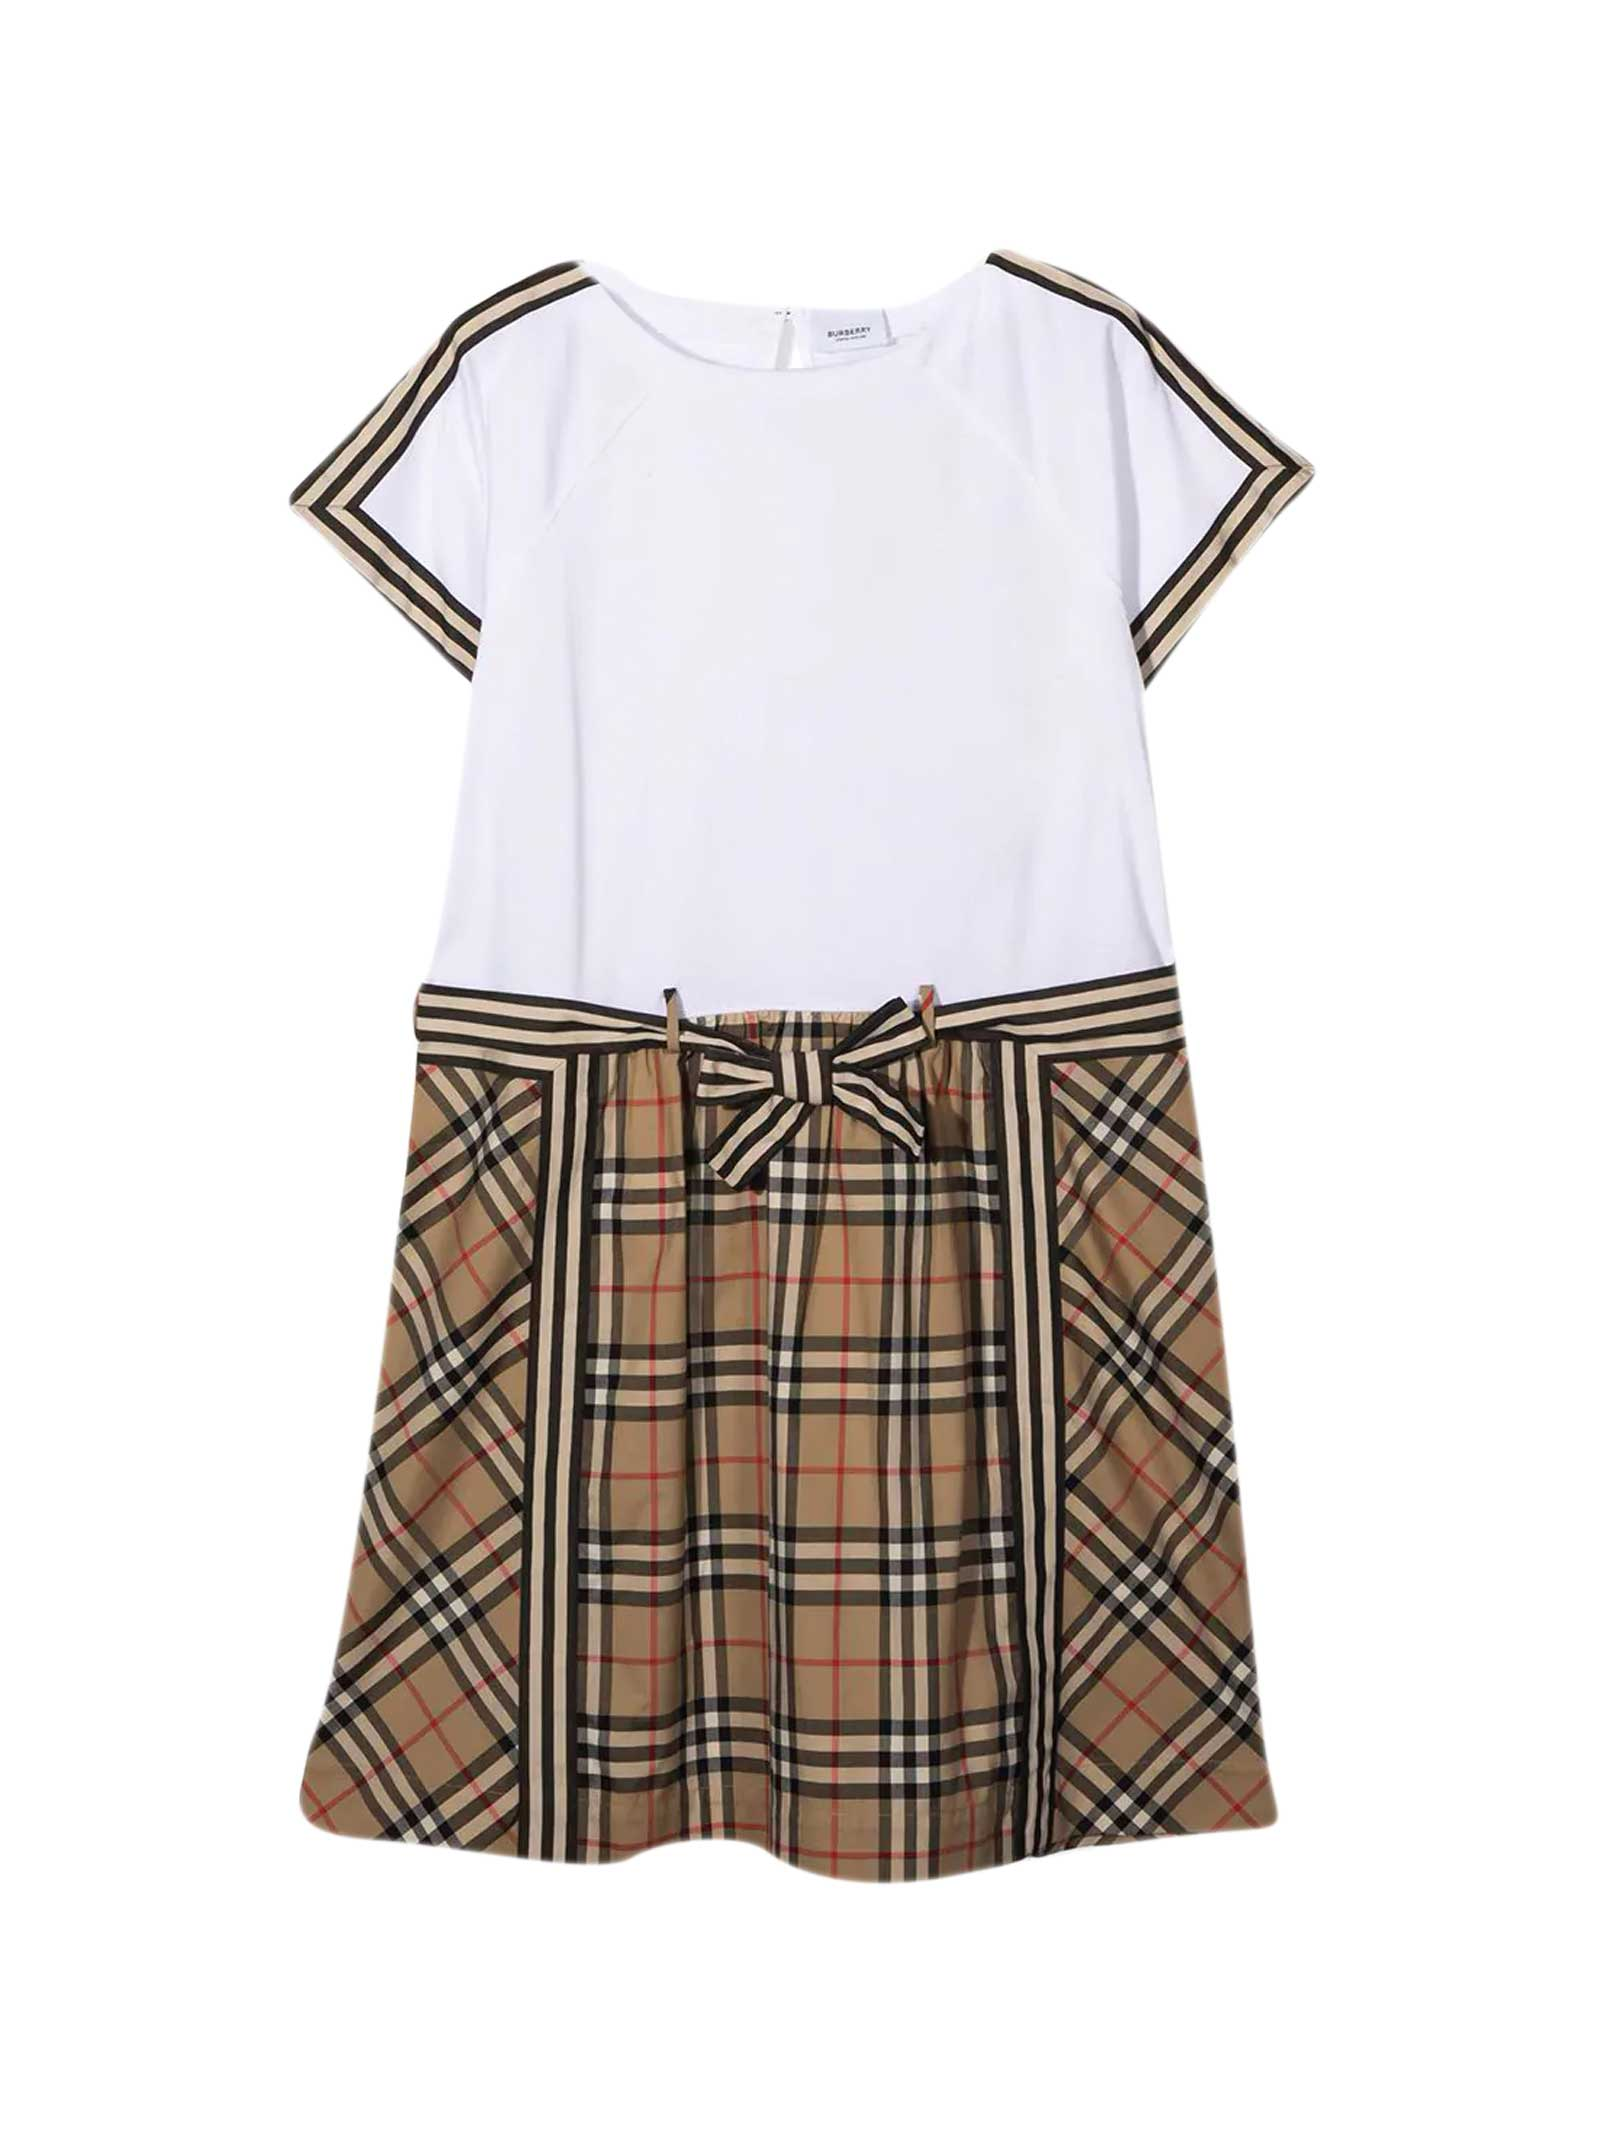 Burberry White Teen Dress In Beige